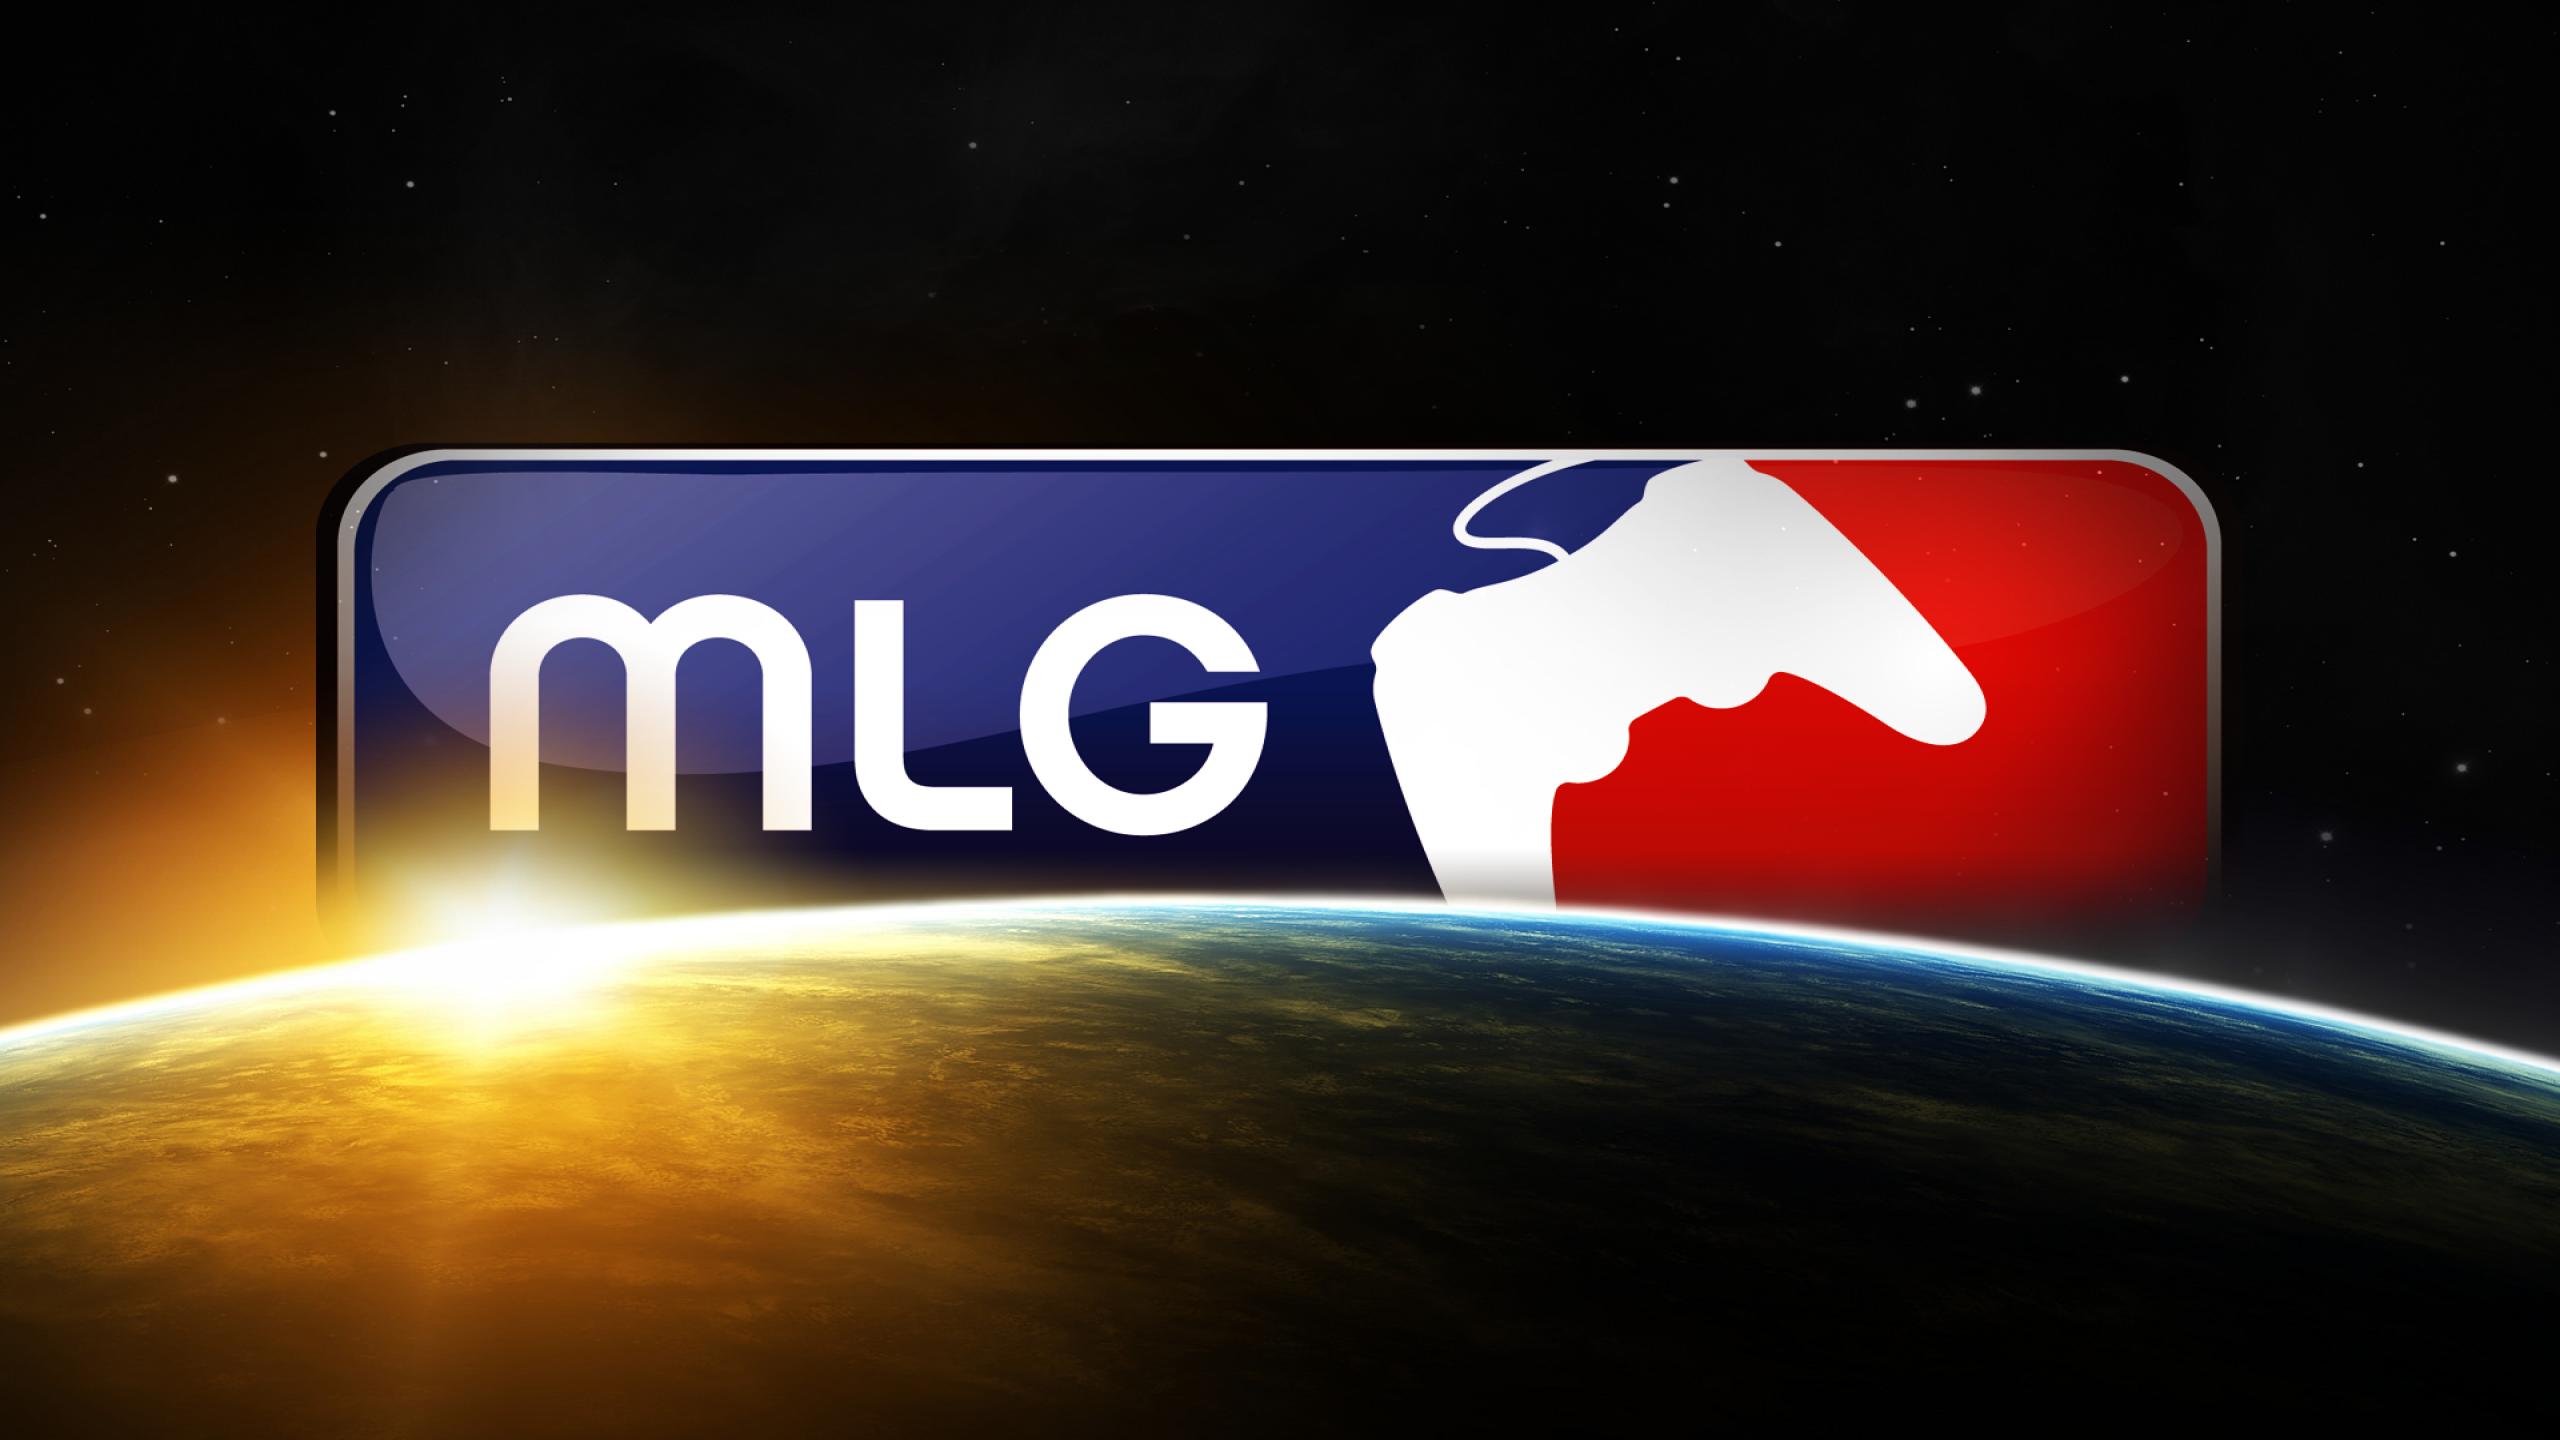 Download Mlg Logo 2560x1440 HD Wallpaper 2560x1440